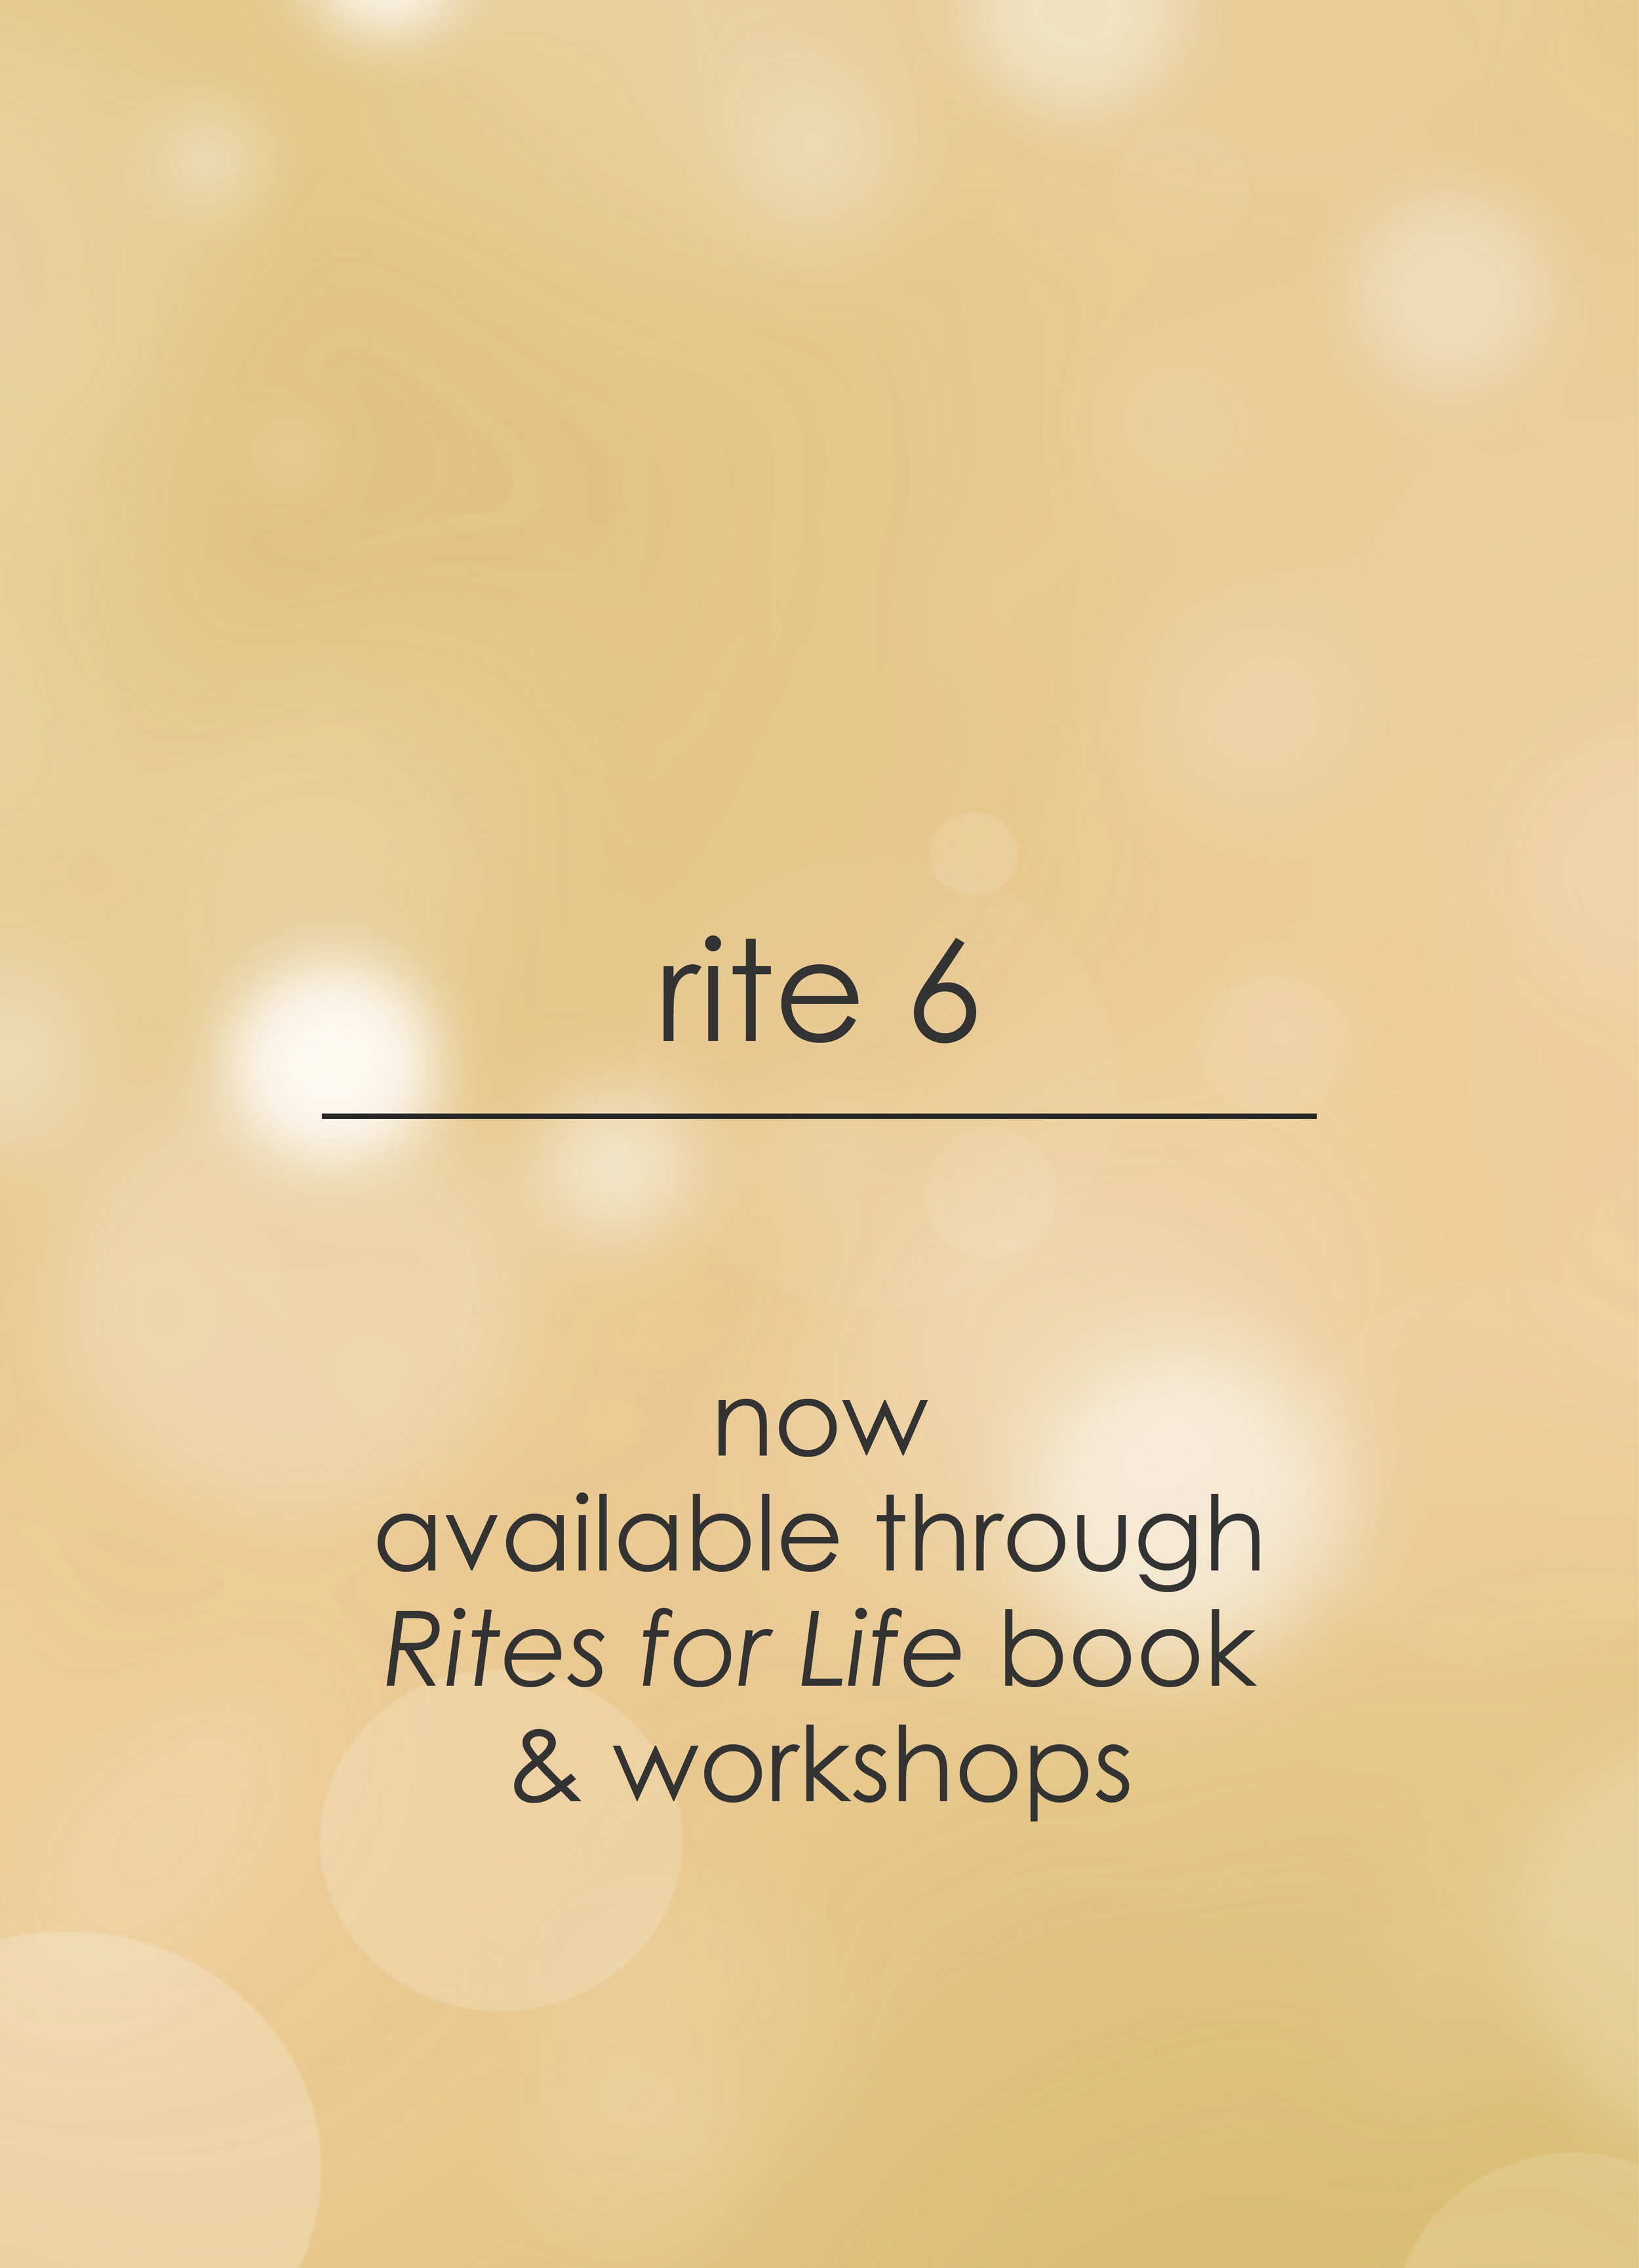 rites_for_life_yoga_rite_6d.jpg